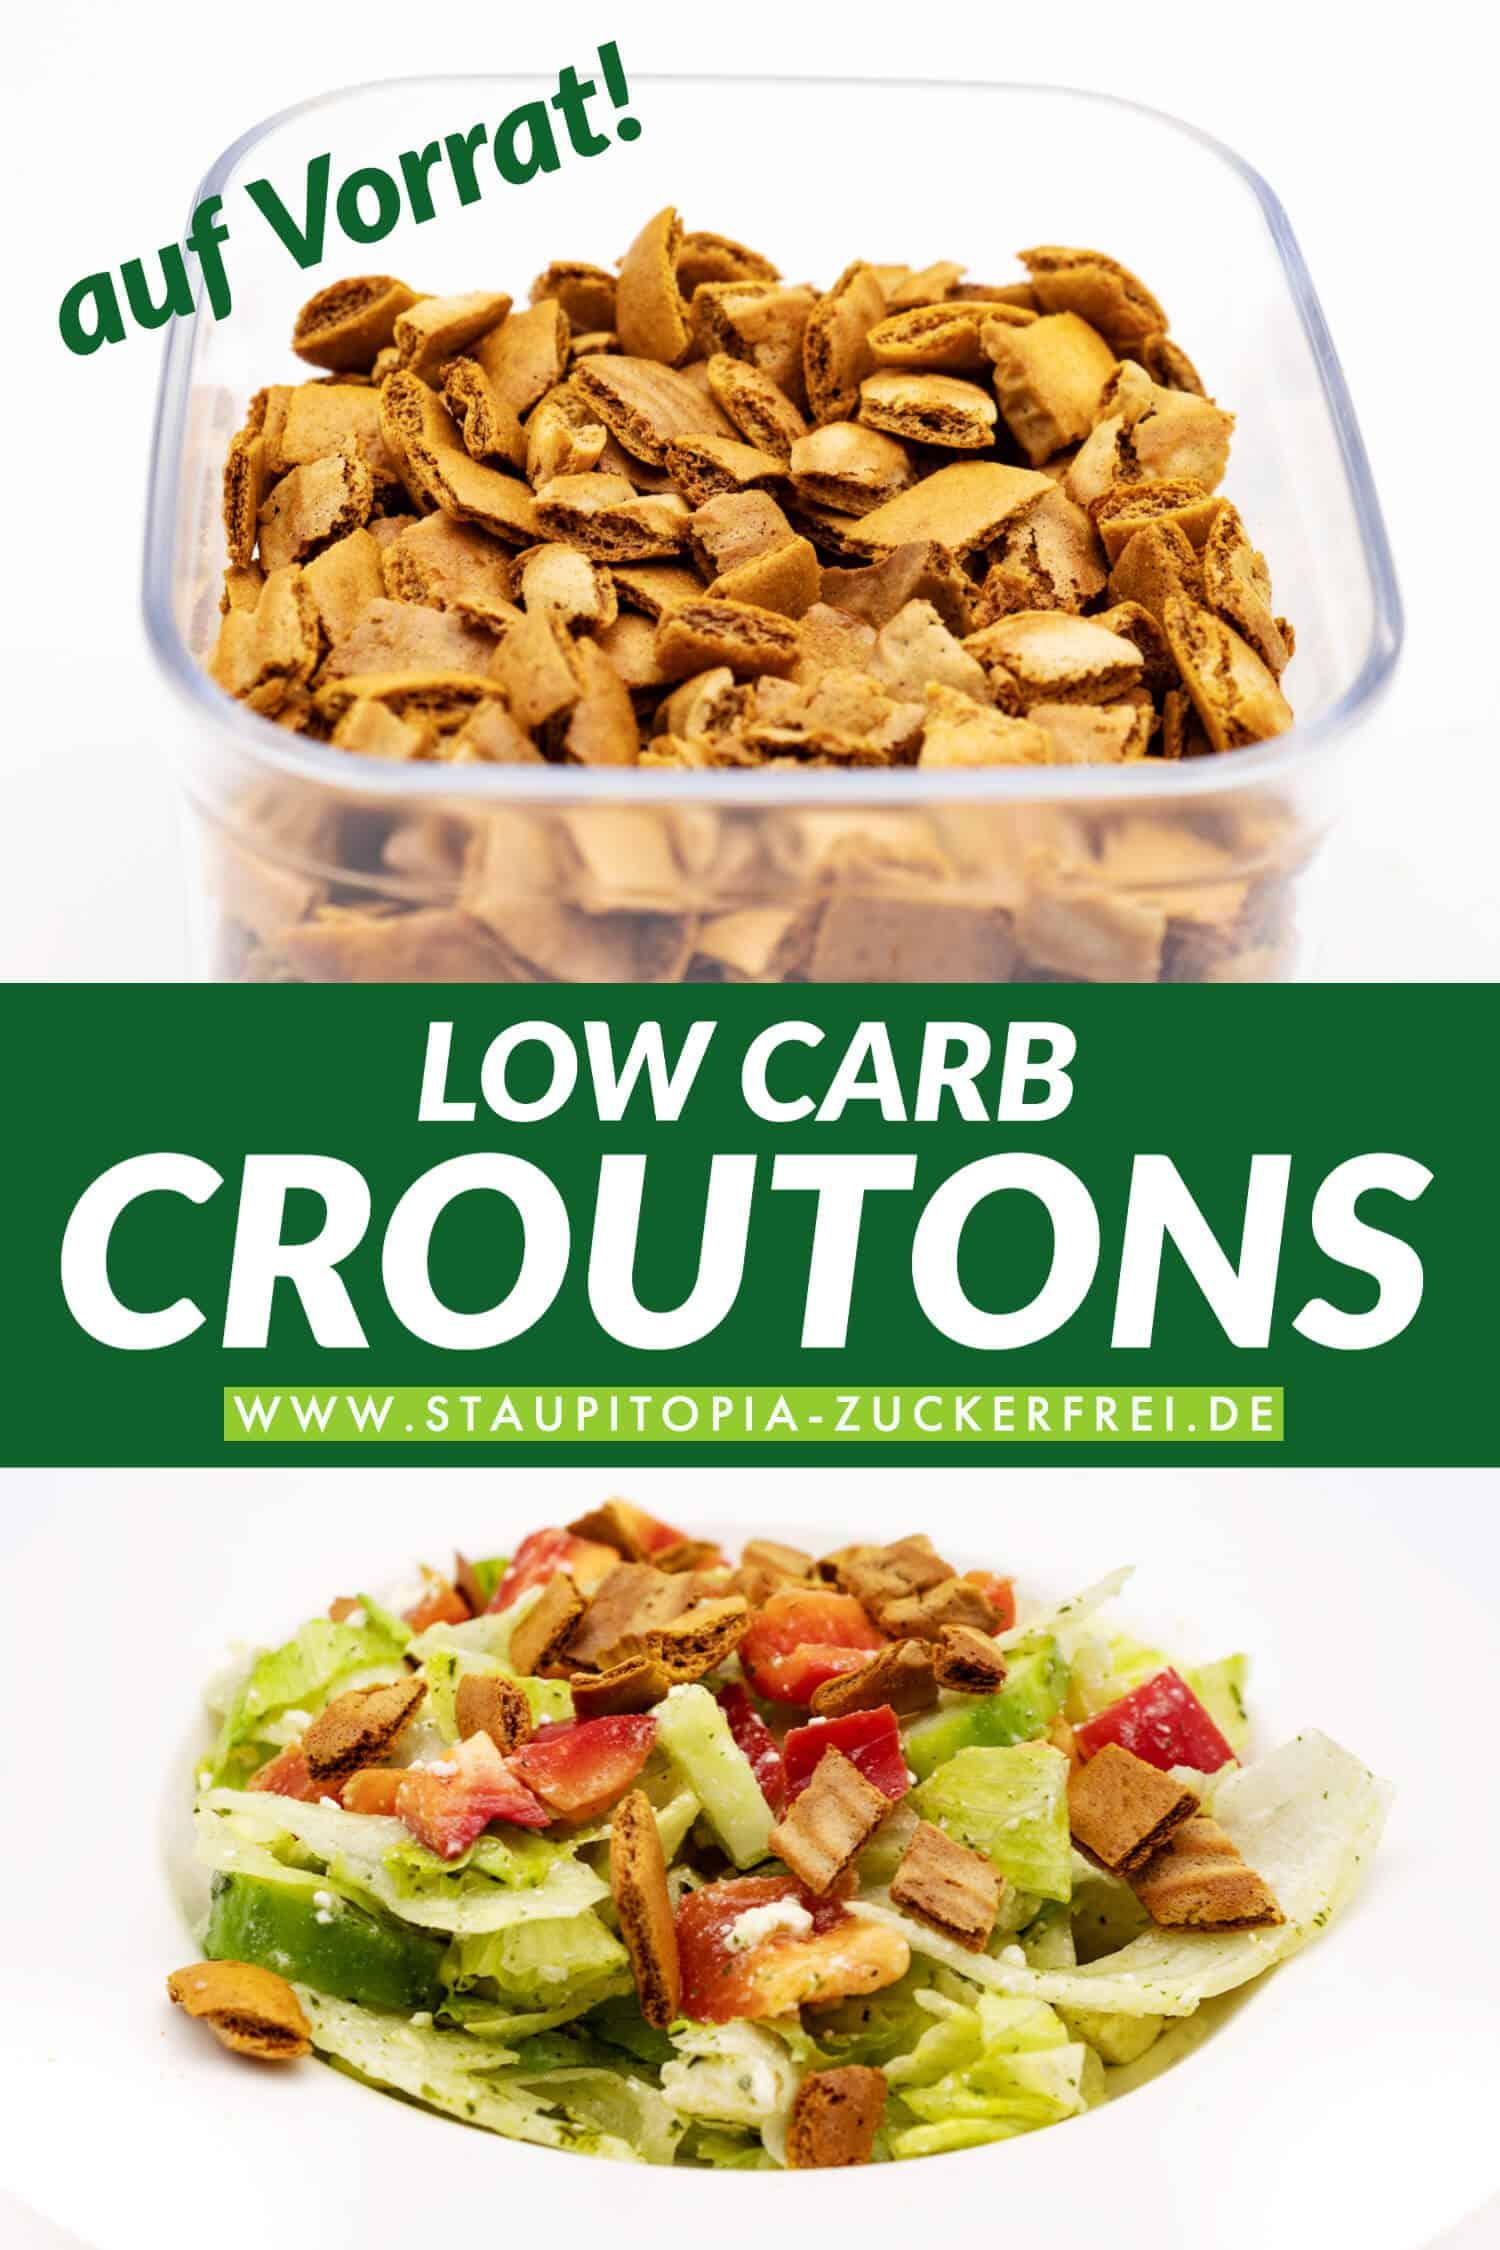 Low Carb Croutons selber machen